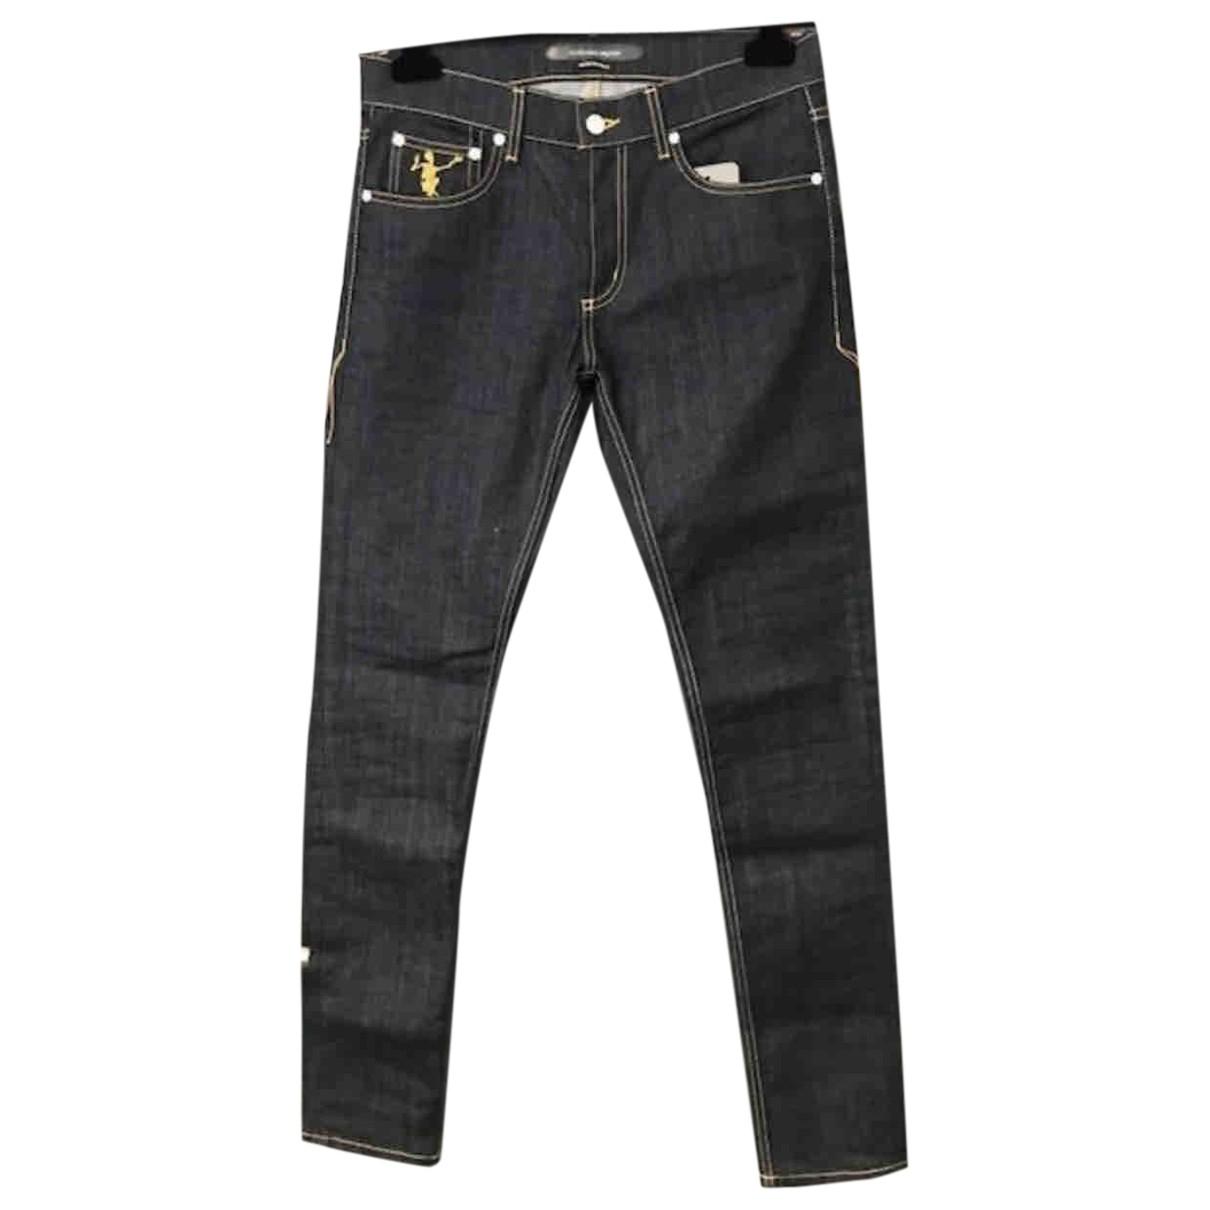 Alexander Mcqueen \N Navy Cotton - elasthane Jeans for Men 36 US